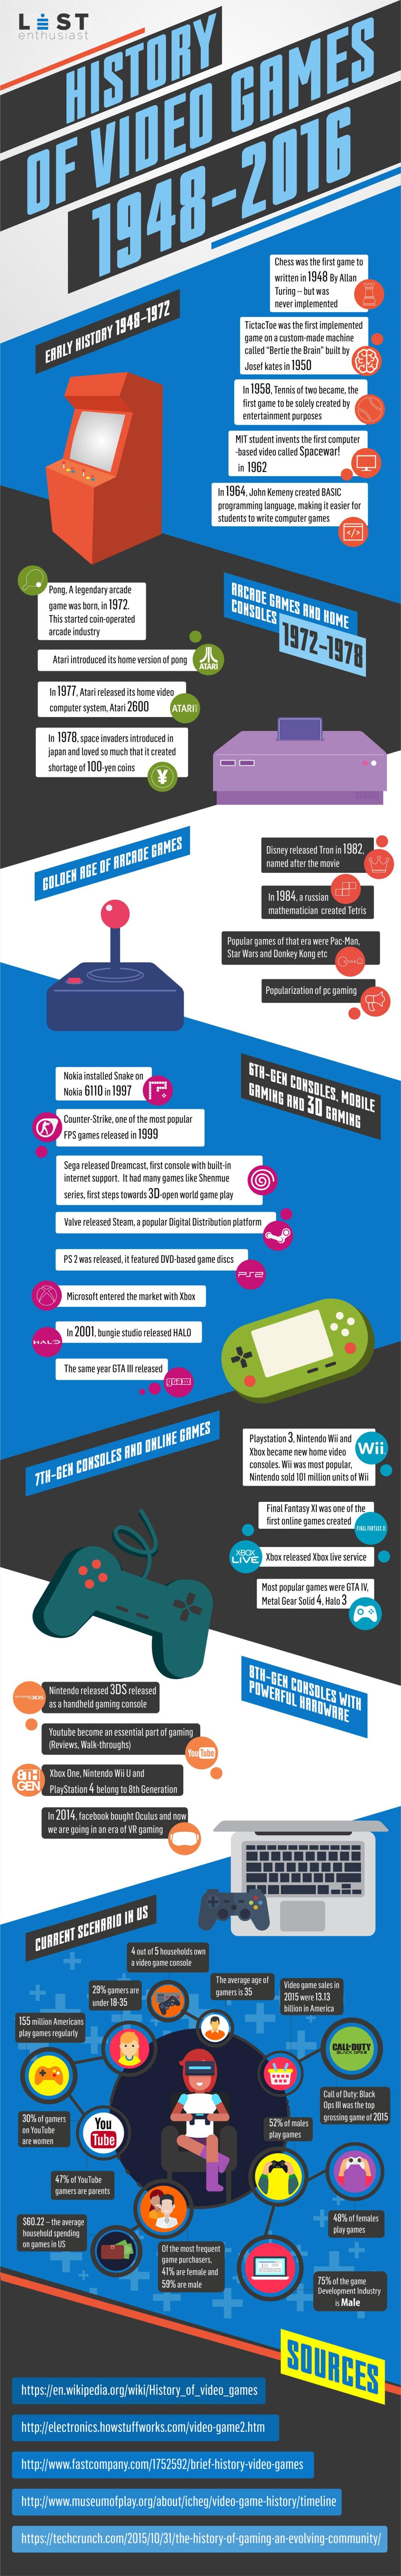 Historia gier wideo od 1948 do 2016 roku [infografika]